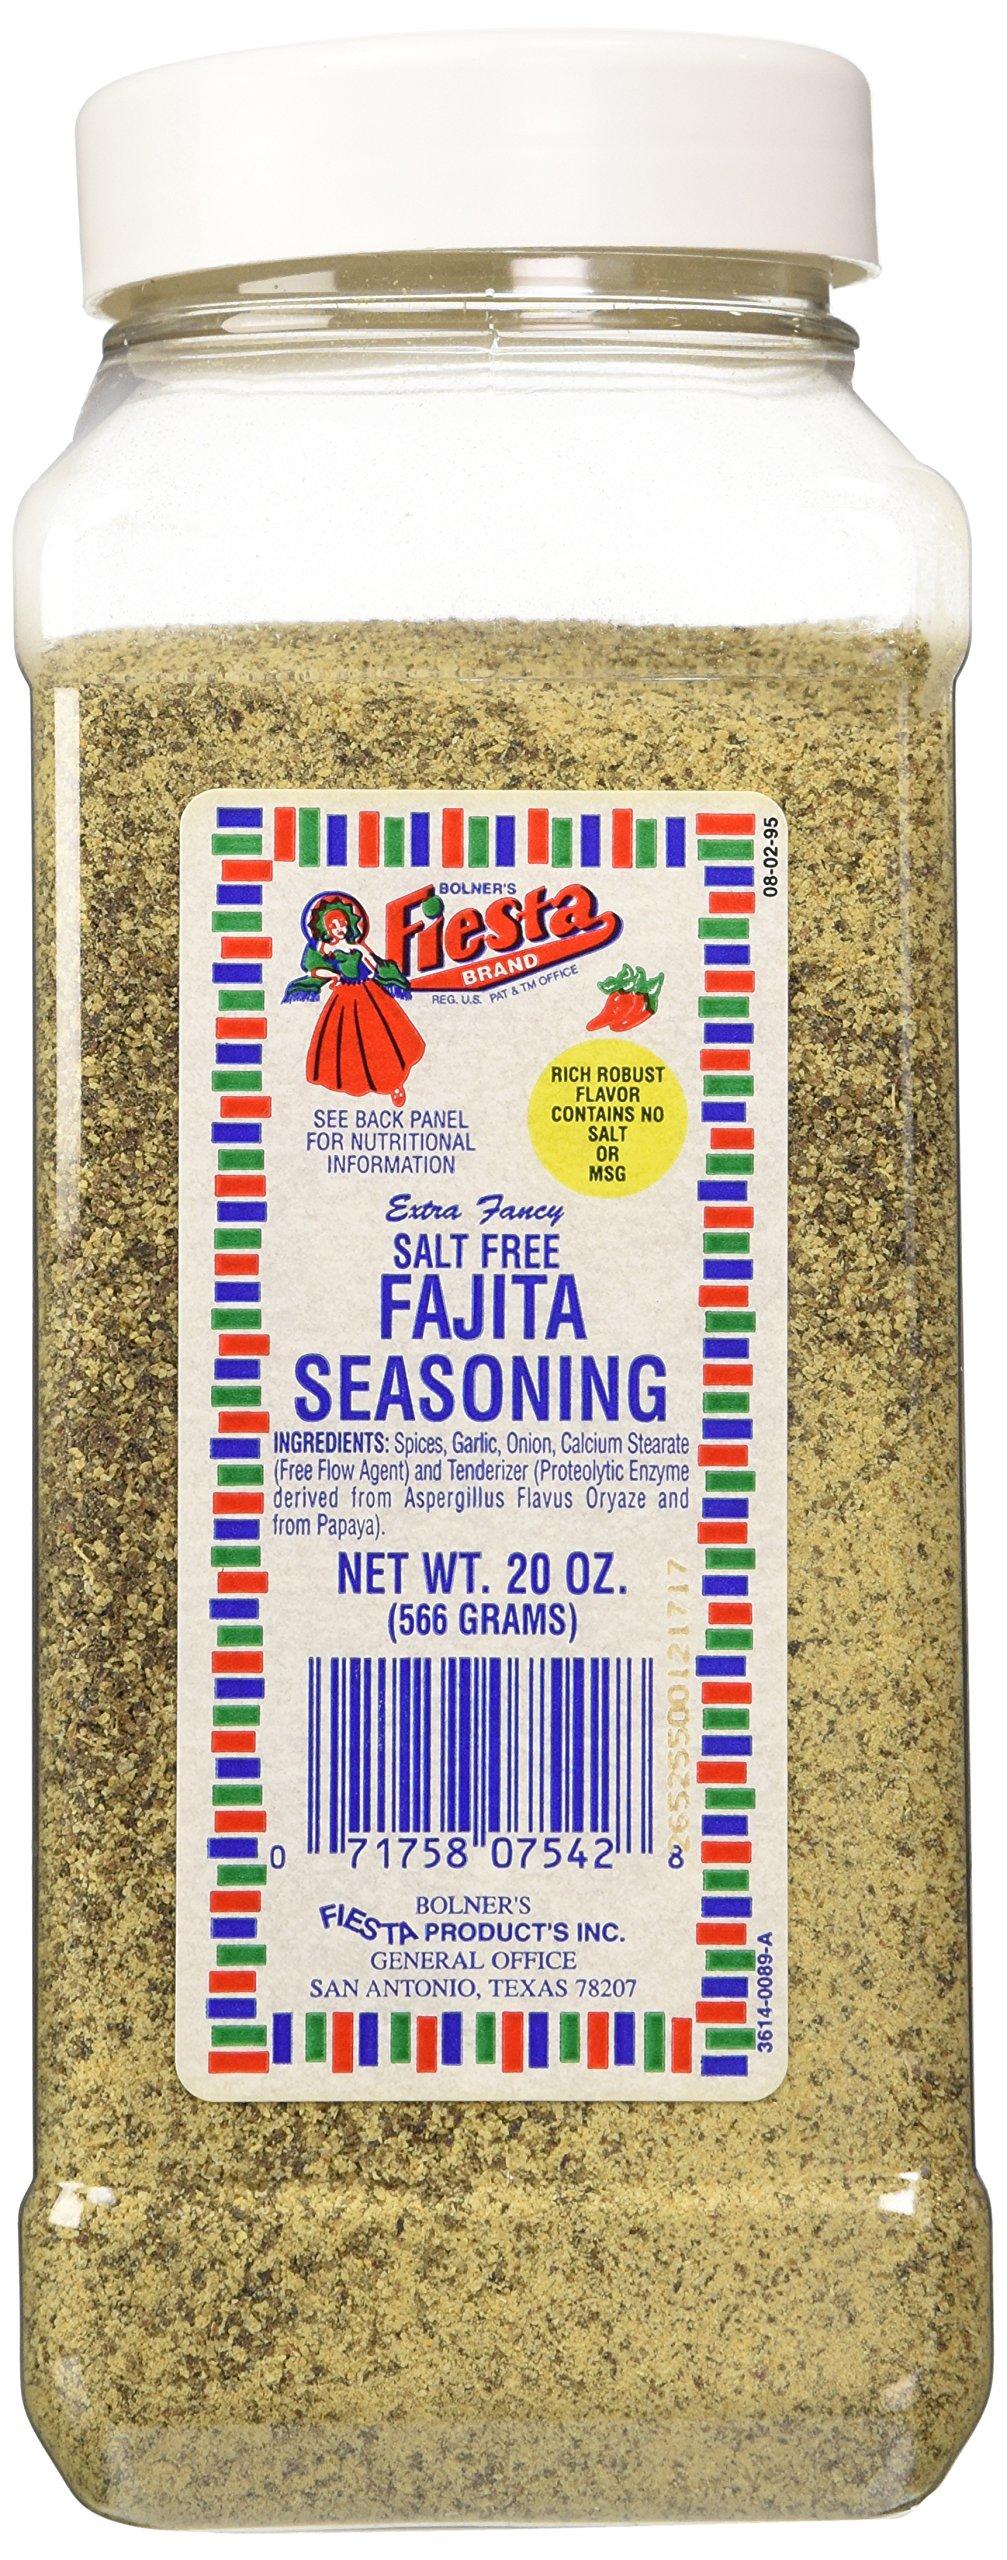 Bolner's Fiesta Extra Fancy Salt Free Fajita Seasoning, 20 Oz.